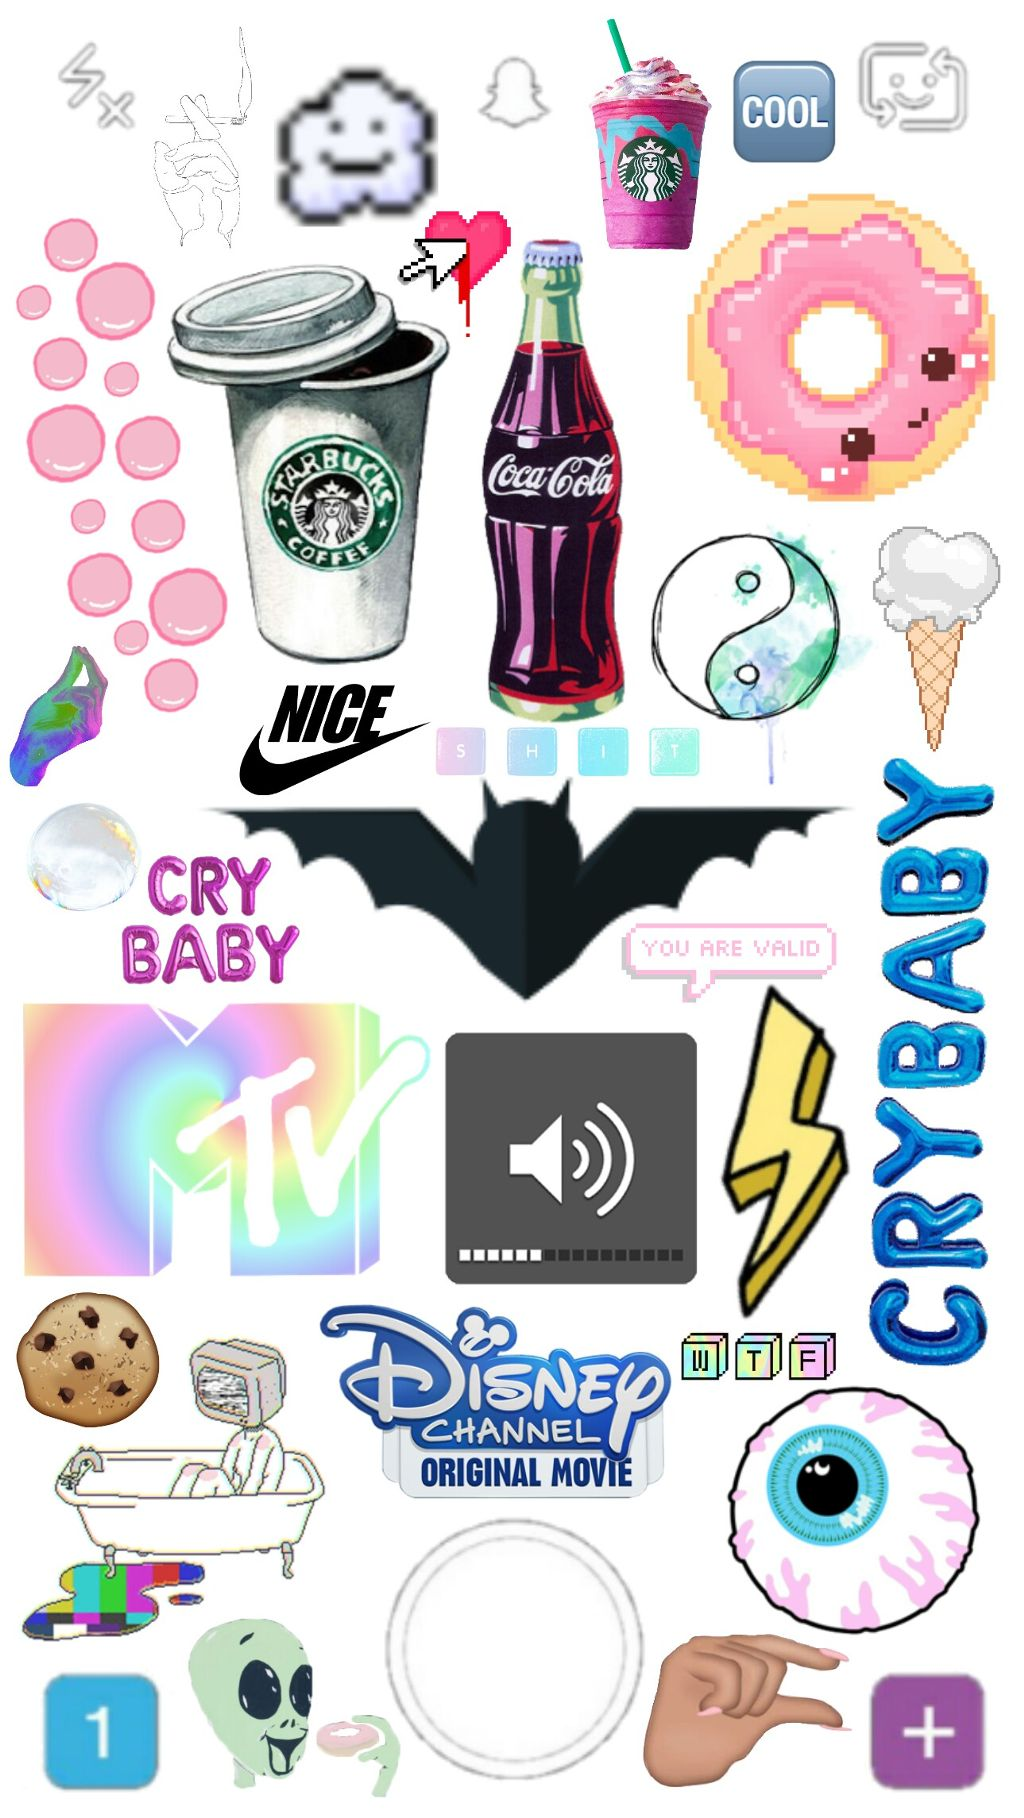 Collage Tumblr Sticker Stickers Cool Fondodepantalla